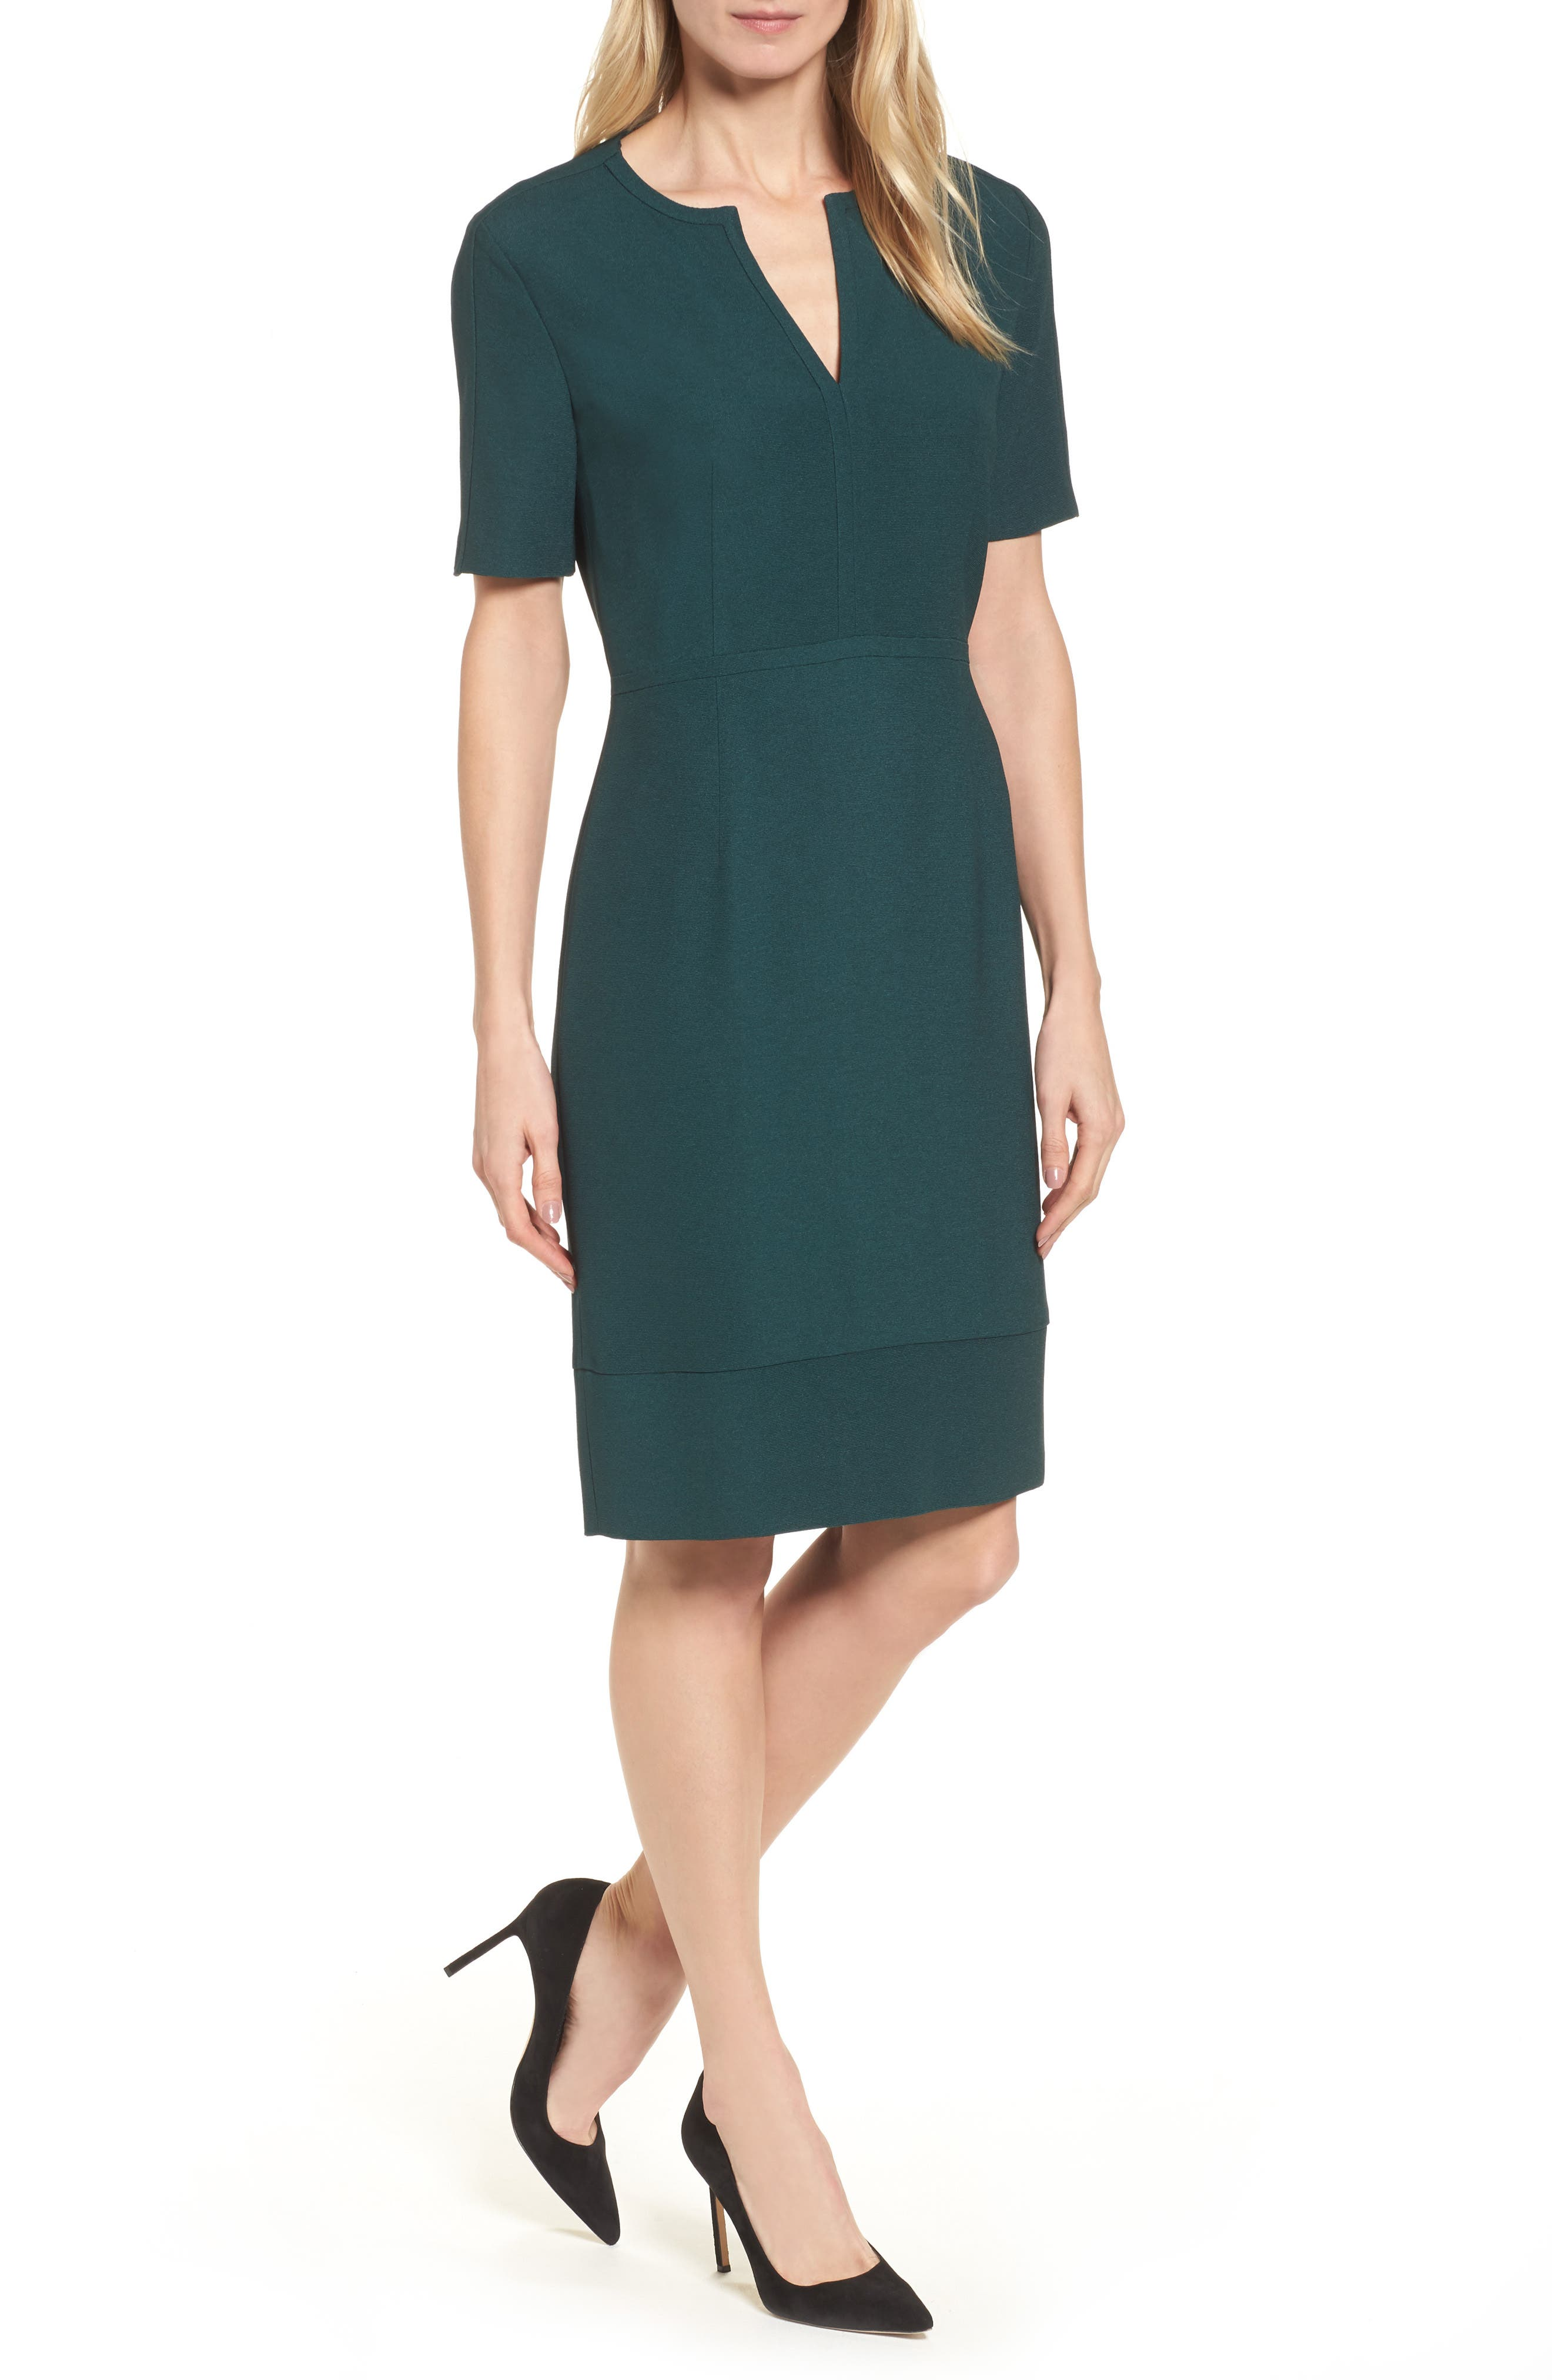 Dalesana Sheath Dress,                             Main thumbnail 1, color,                             301